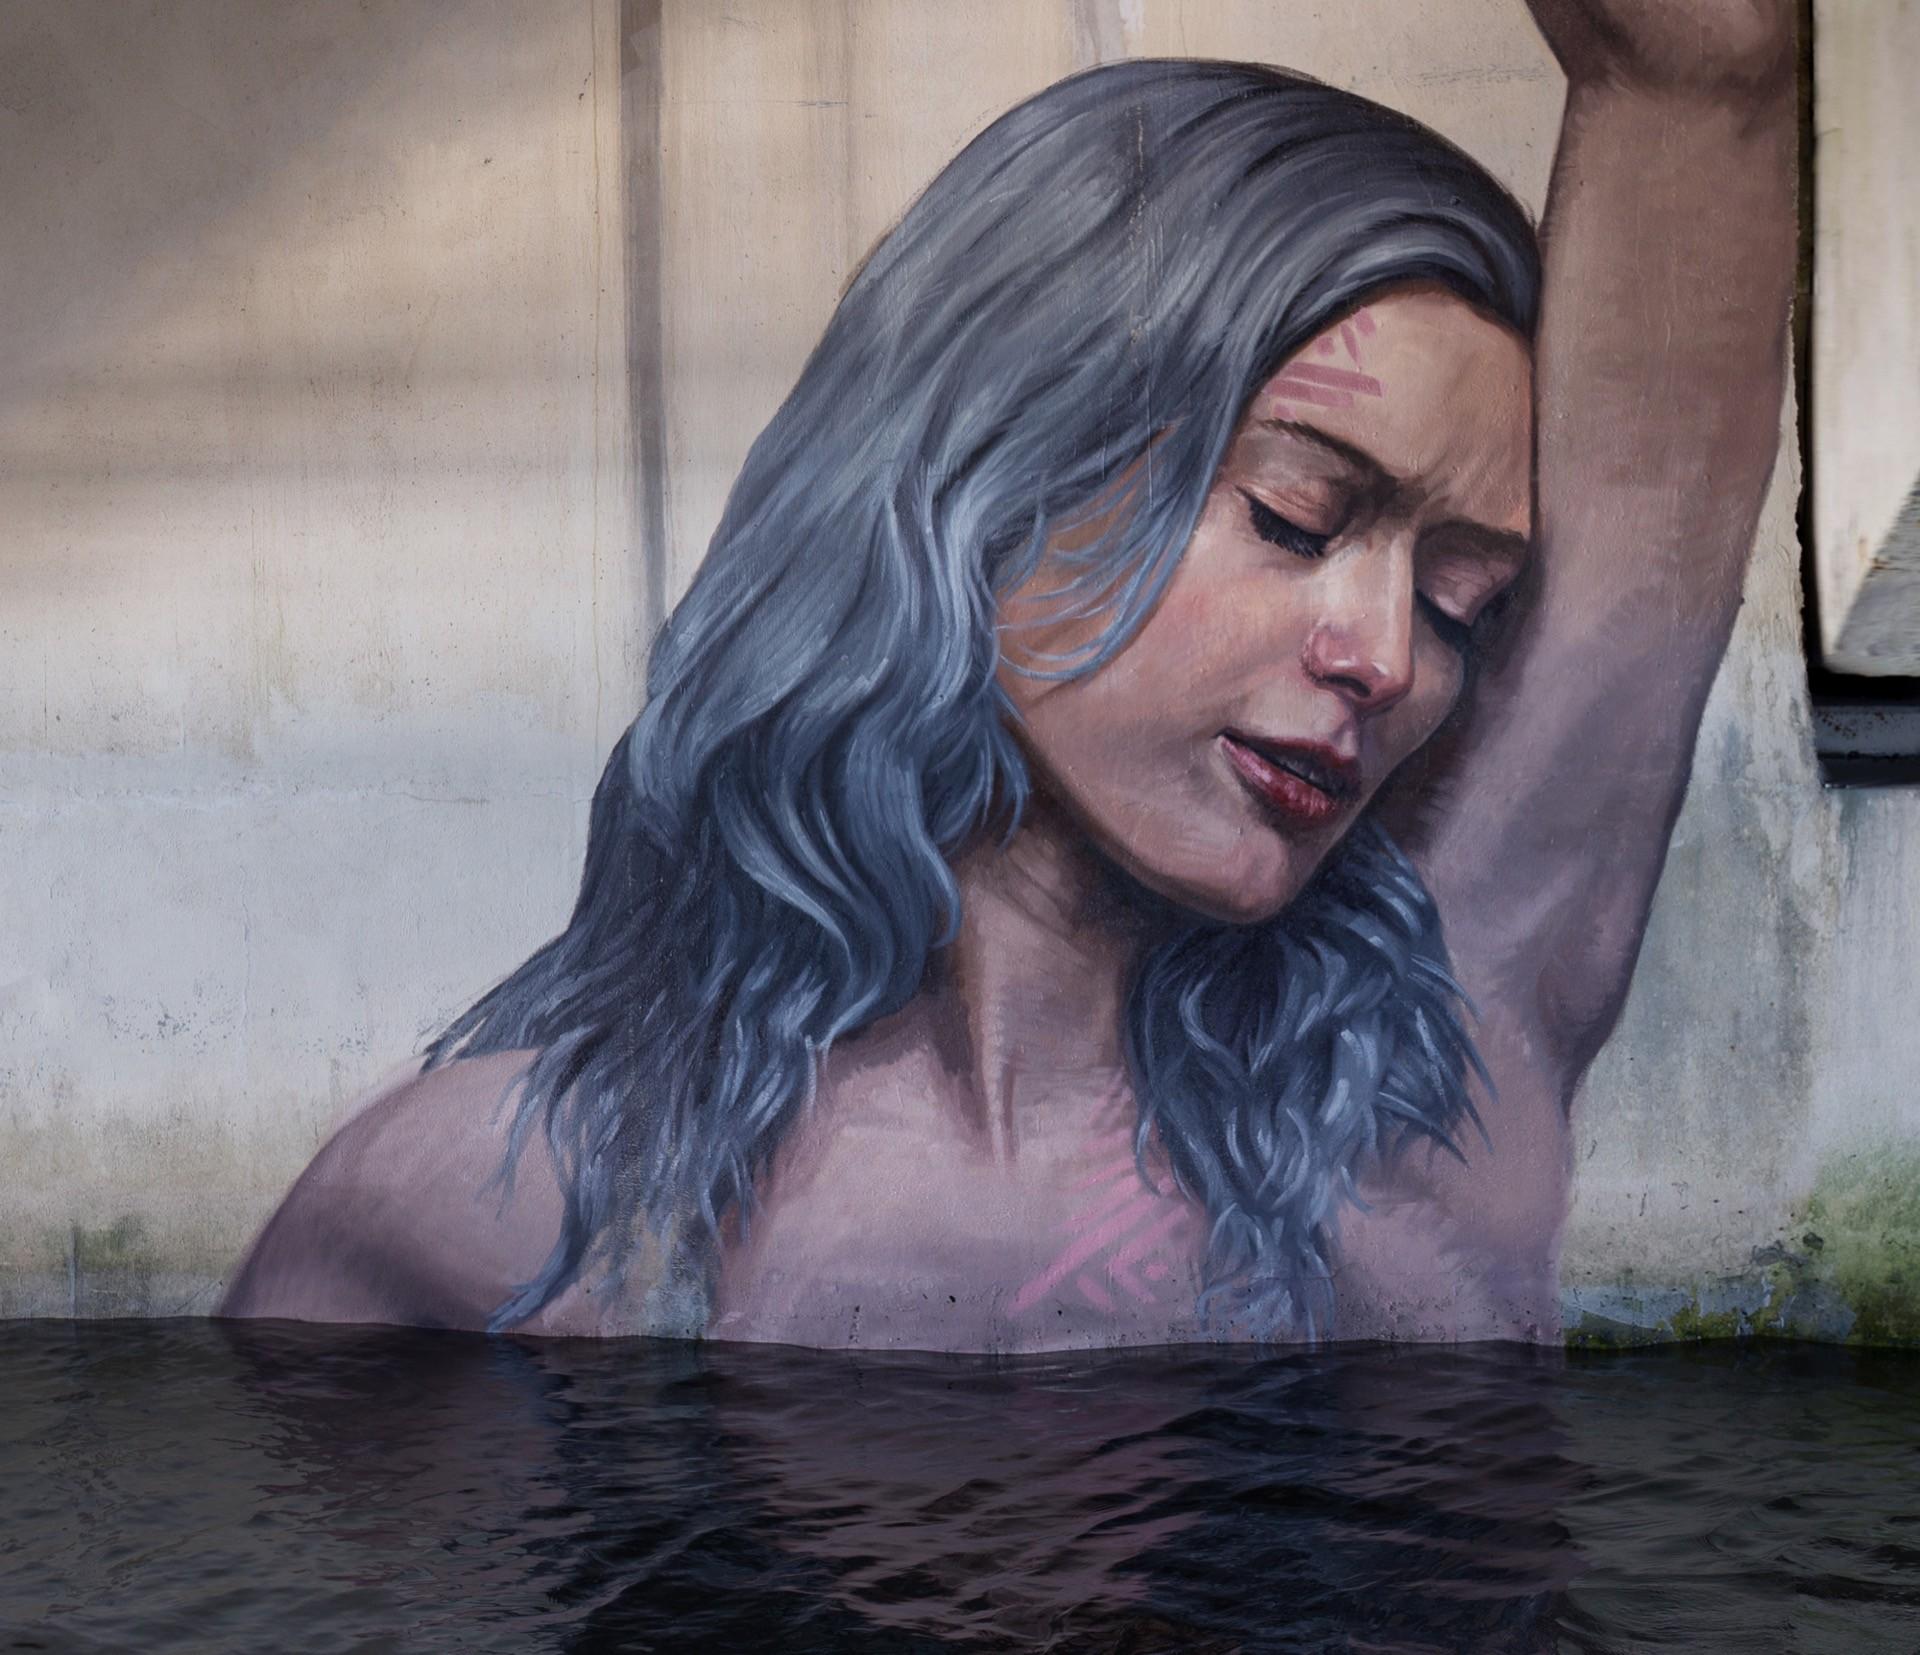 The Hula blends water and street art in Florida | StreetArtNews